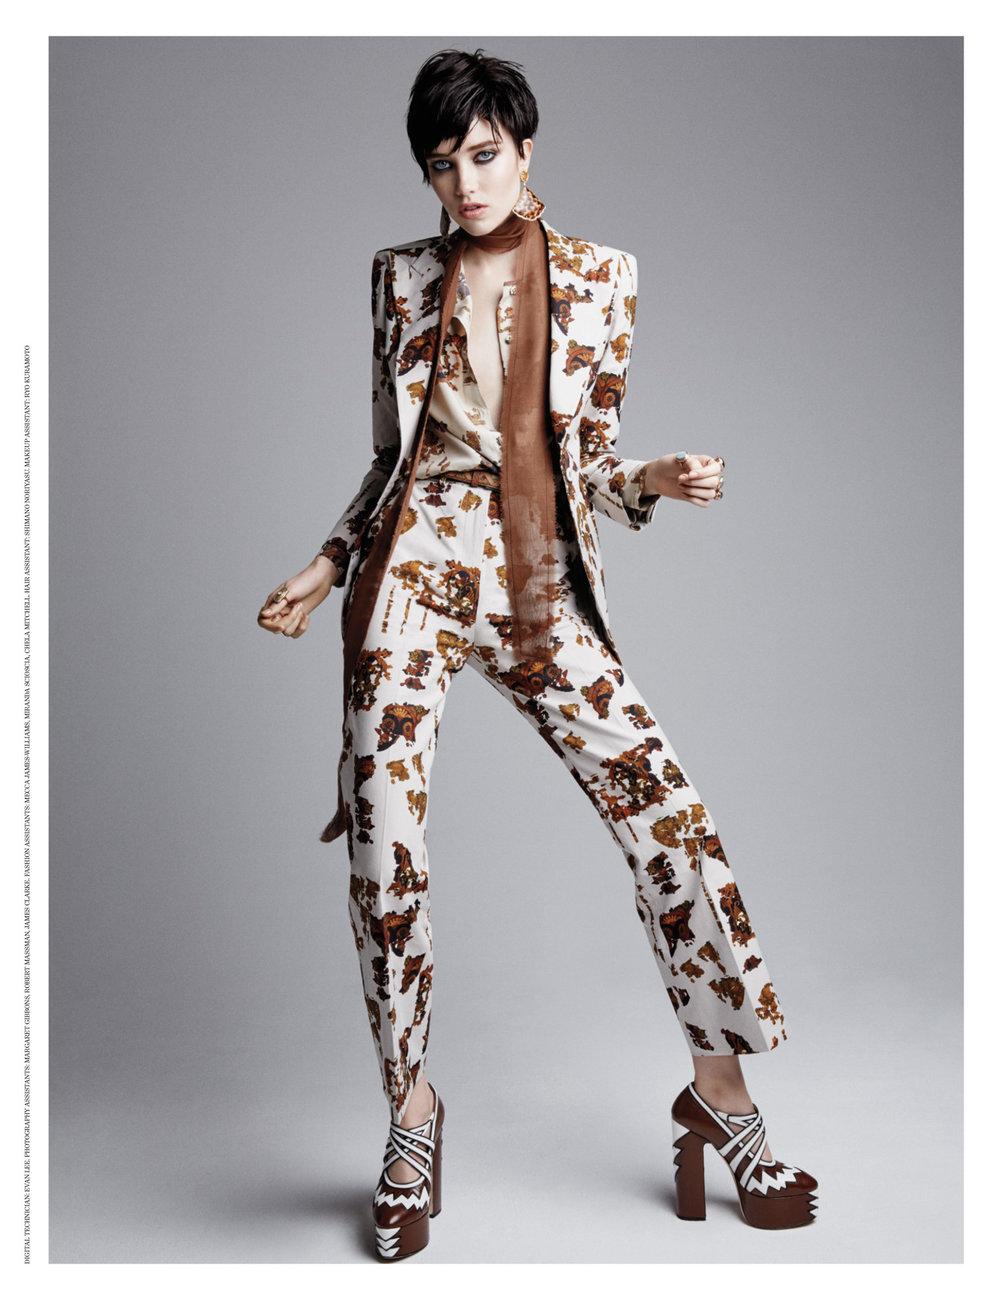 Giovanna-Battaglia-W-Magazine-Funny-Business-Patrick-Demarchelier-8.jpg